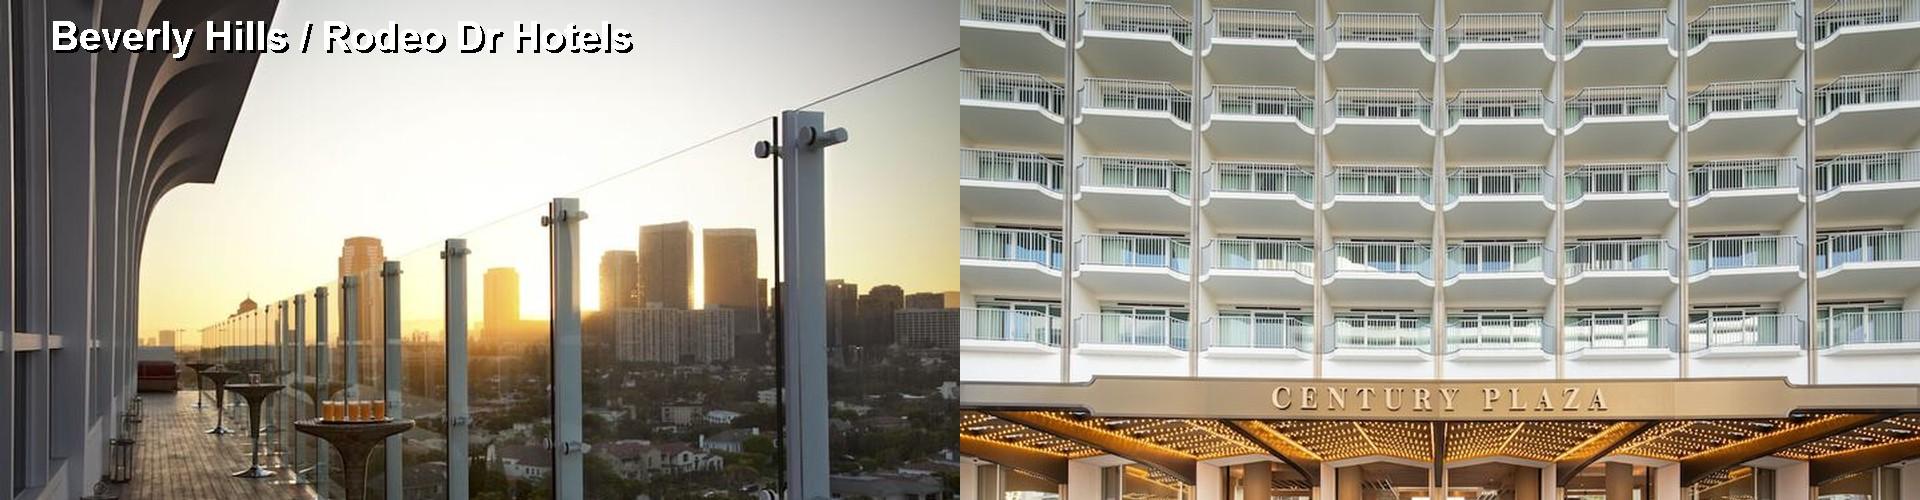 Hotels Near Universal City Walk Ca